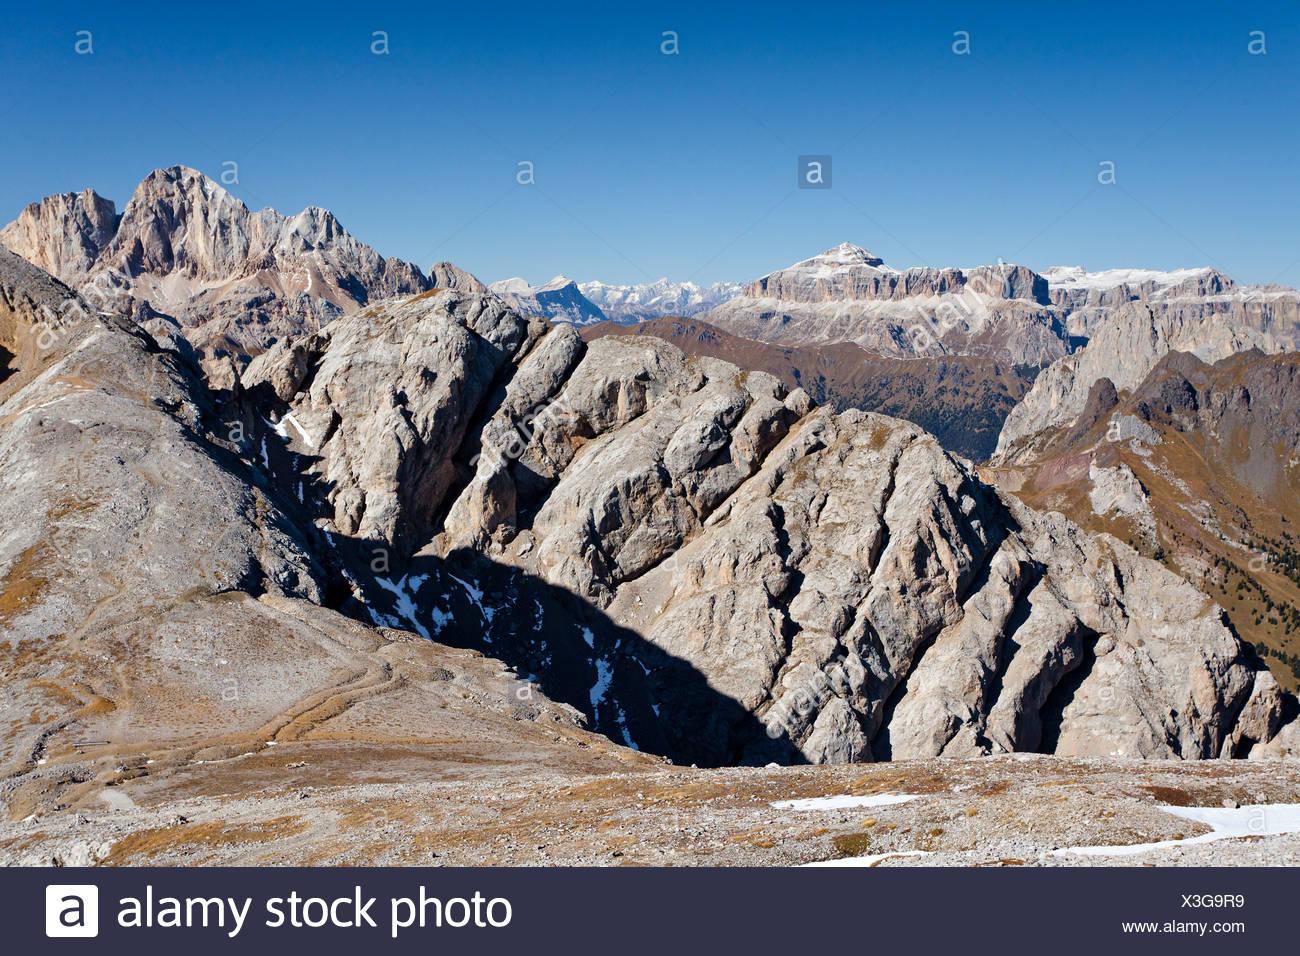 At the Bepi Zac via ferrata in the San Pallegrino valley, above San Pellegrino Pass or Passo San Pellegrino Stock Photo